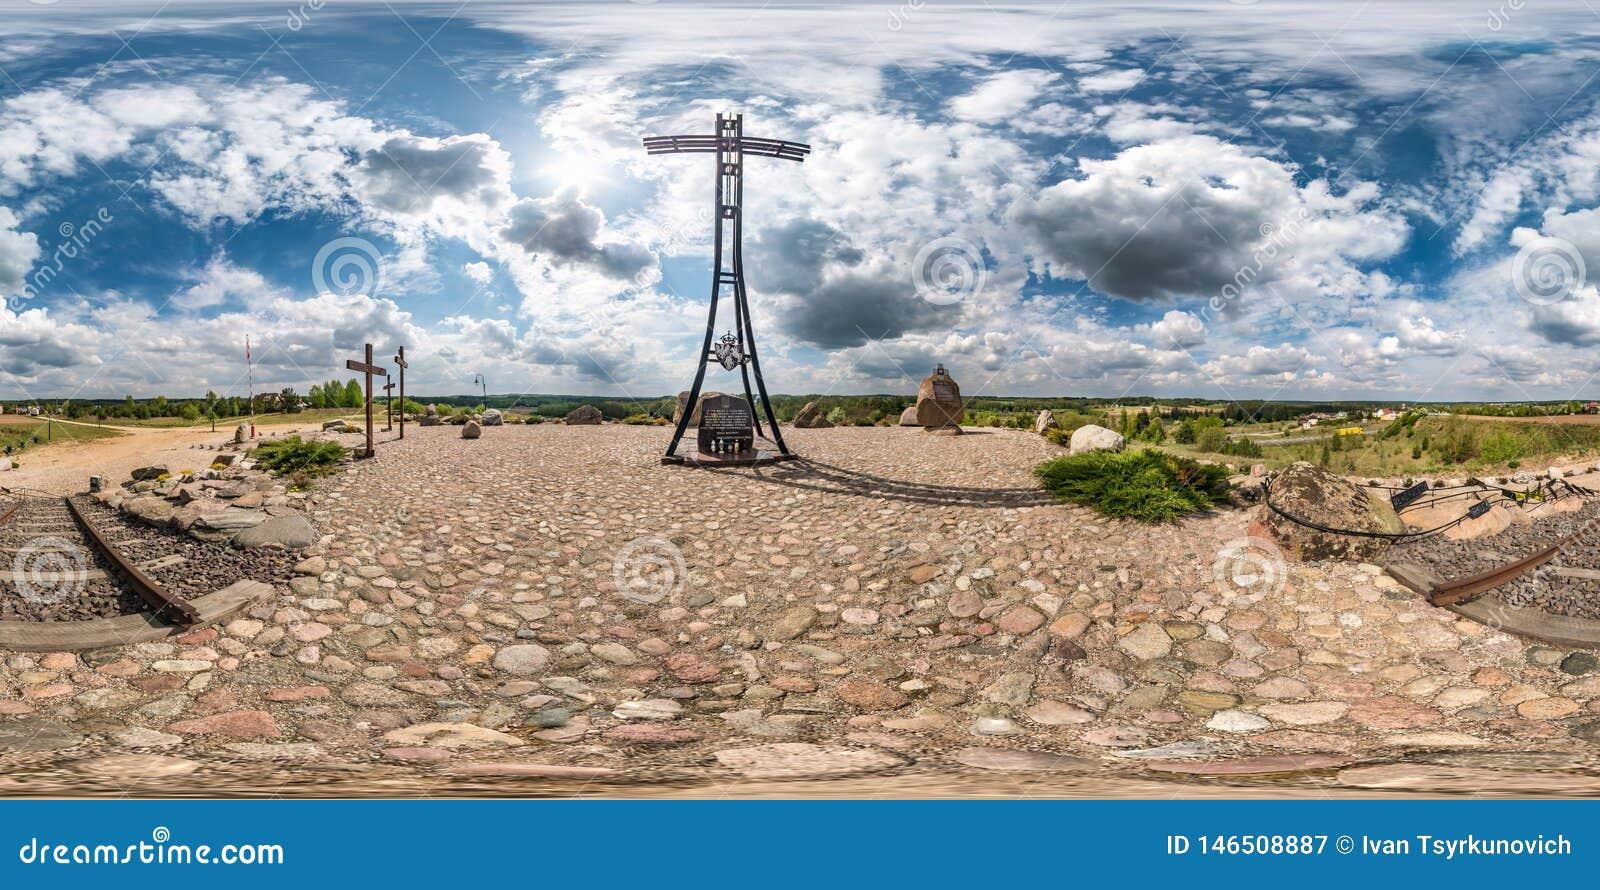 KUZNICA, POLONIA - MAYO DE 2019: Panorama inconsútil completo 360 grados de opinión de ángulo sobre cruz conmemorativa enorme en